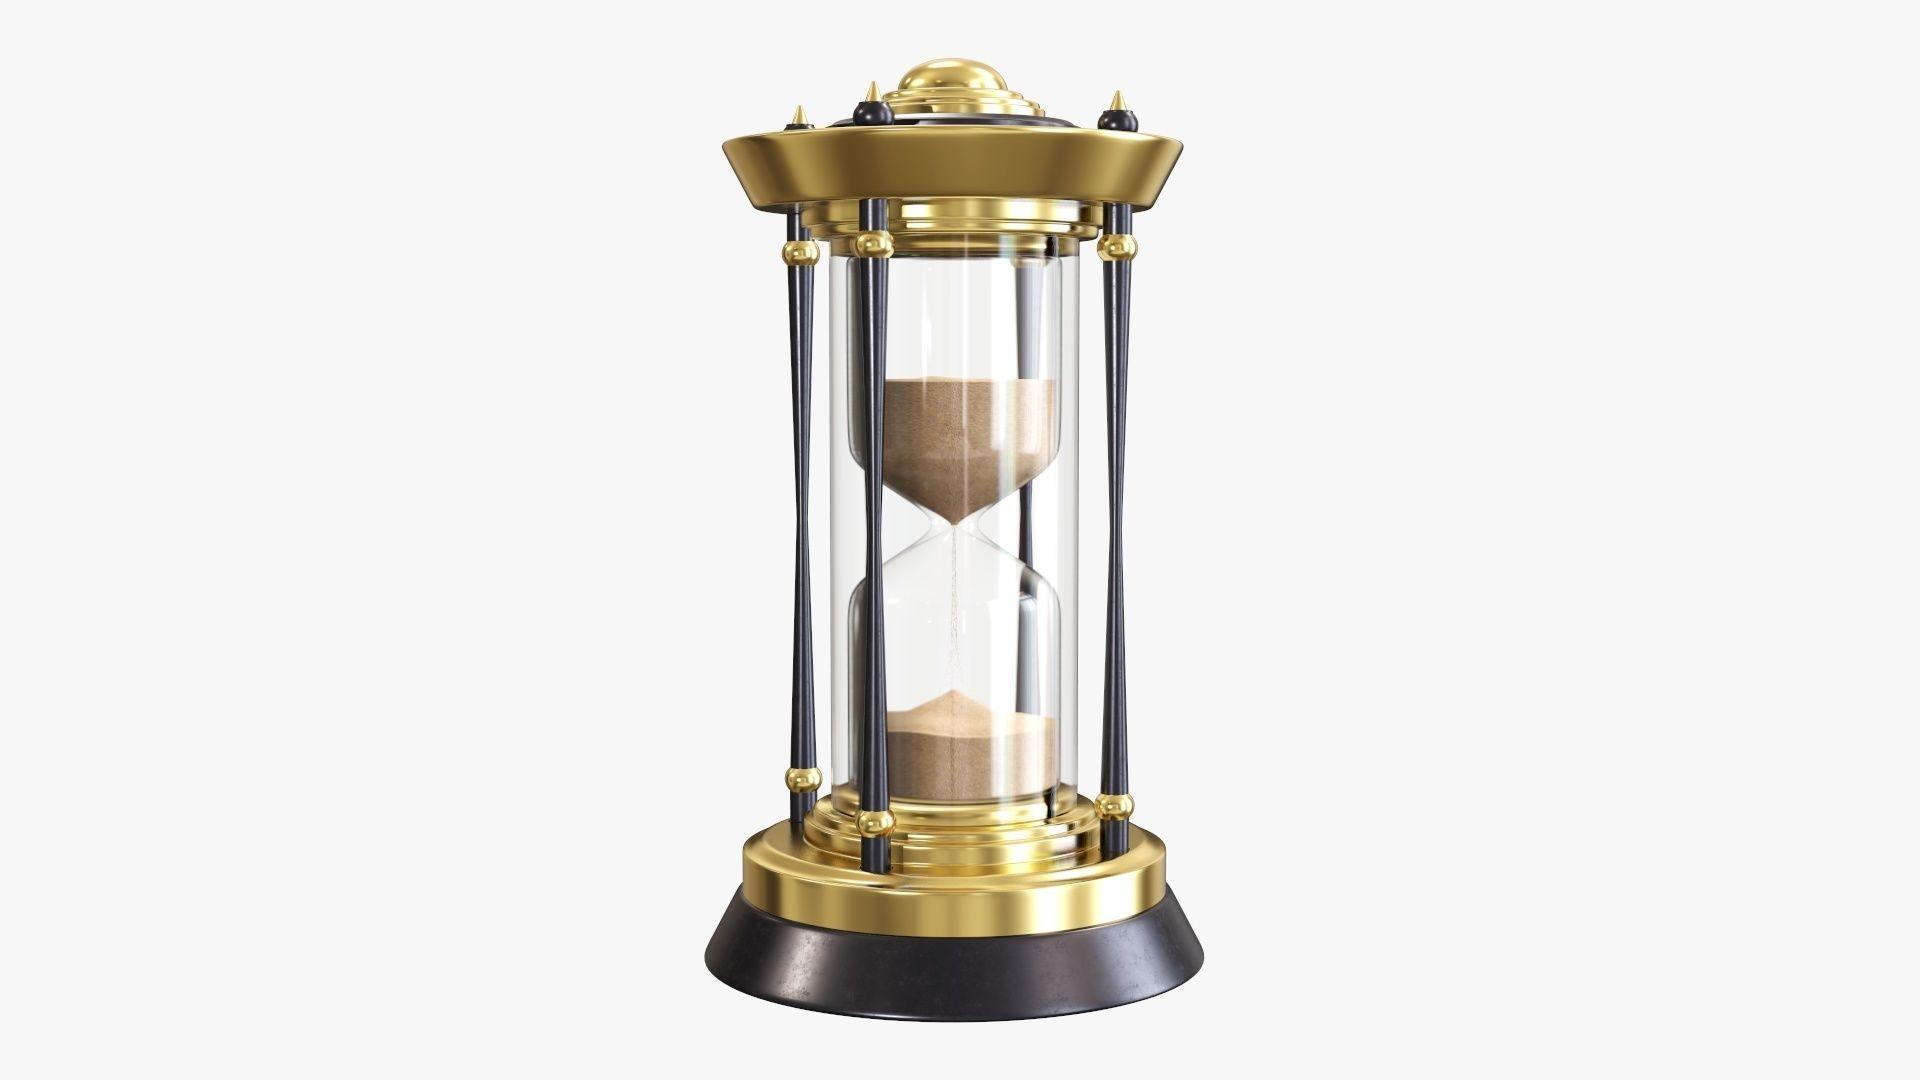 Hourglass sandglass egg sand timer clock 08